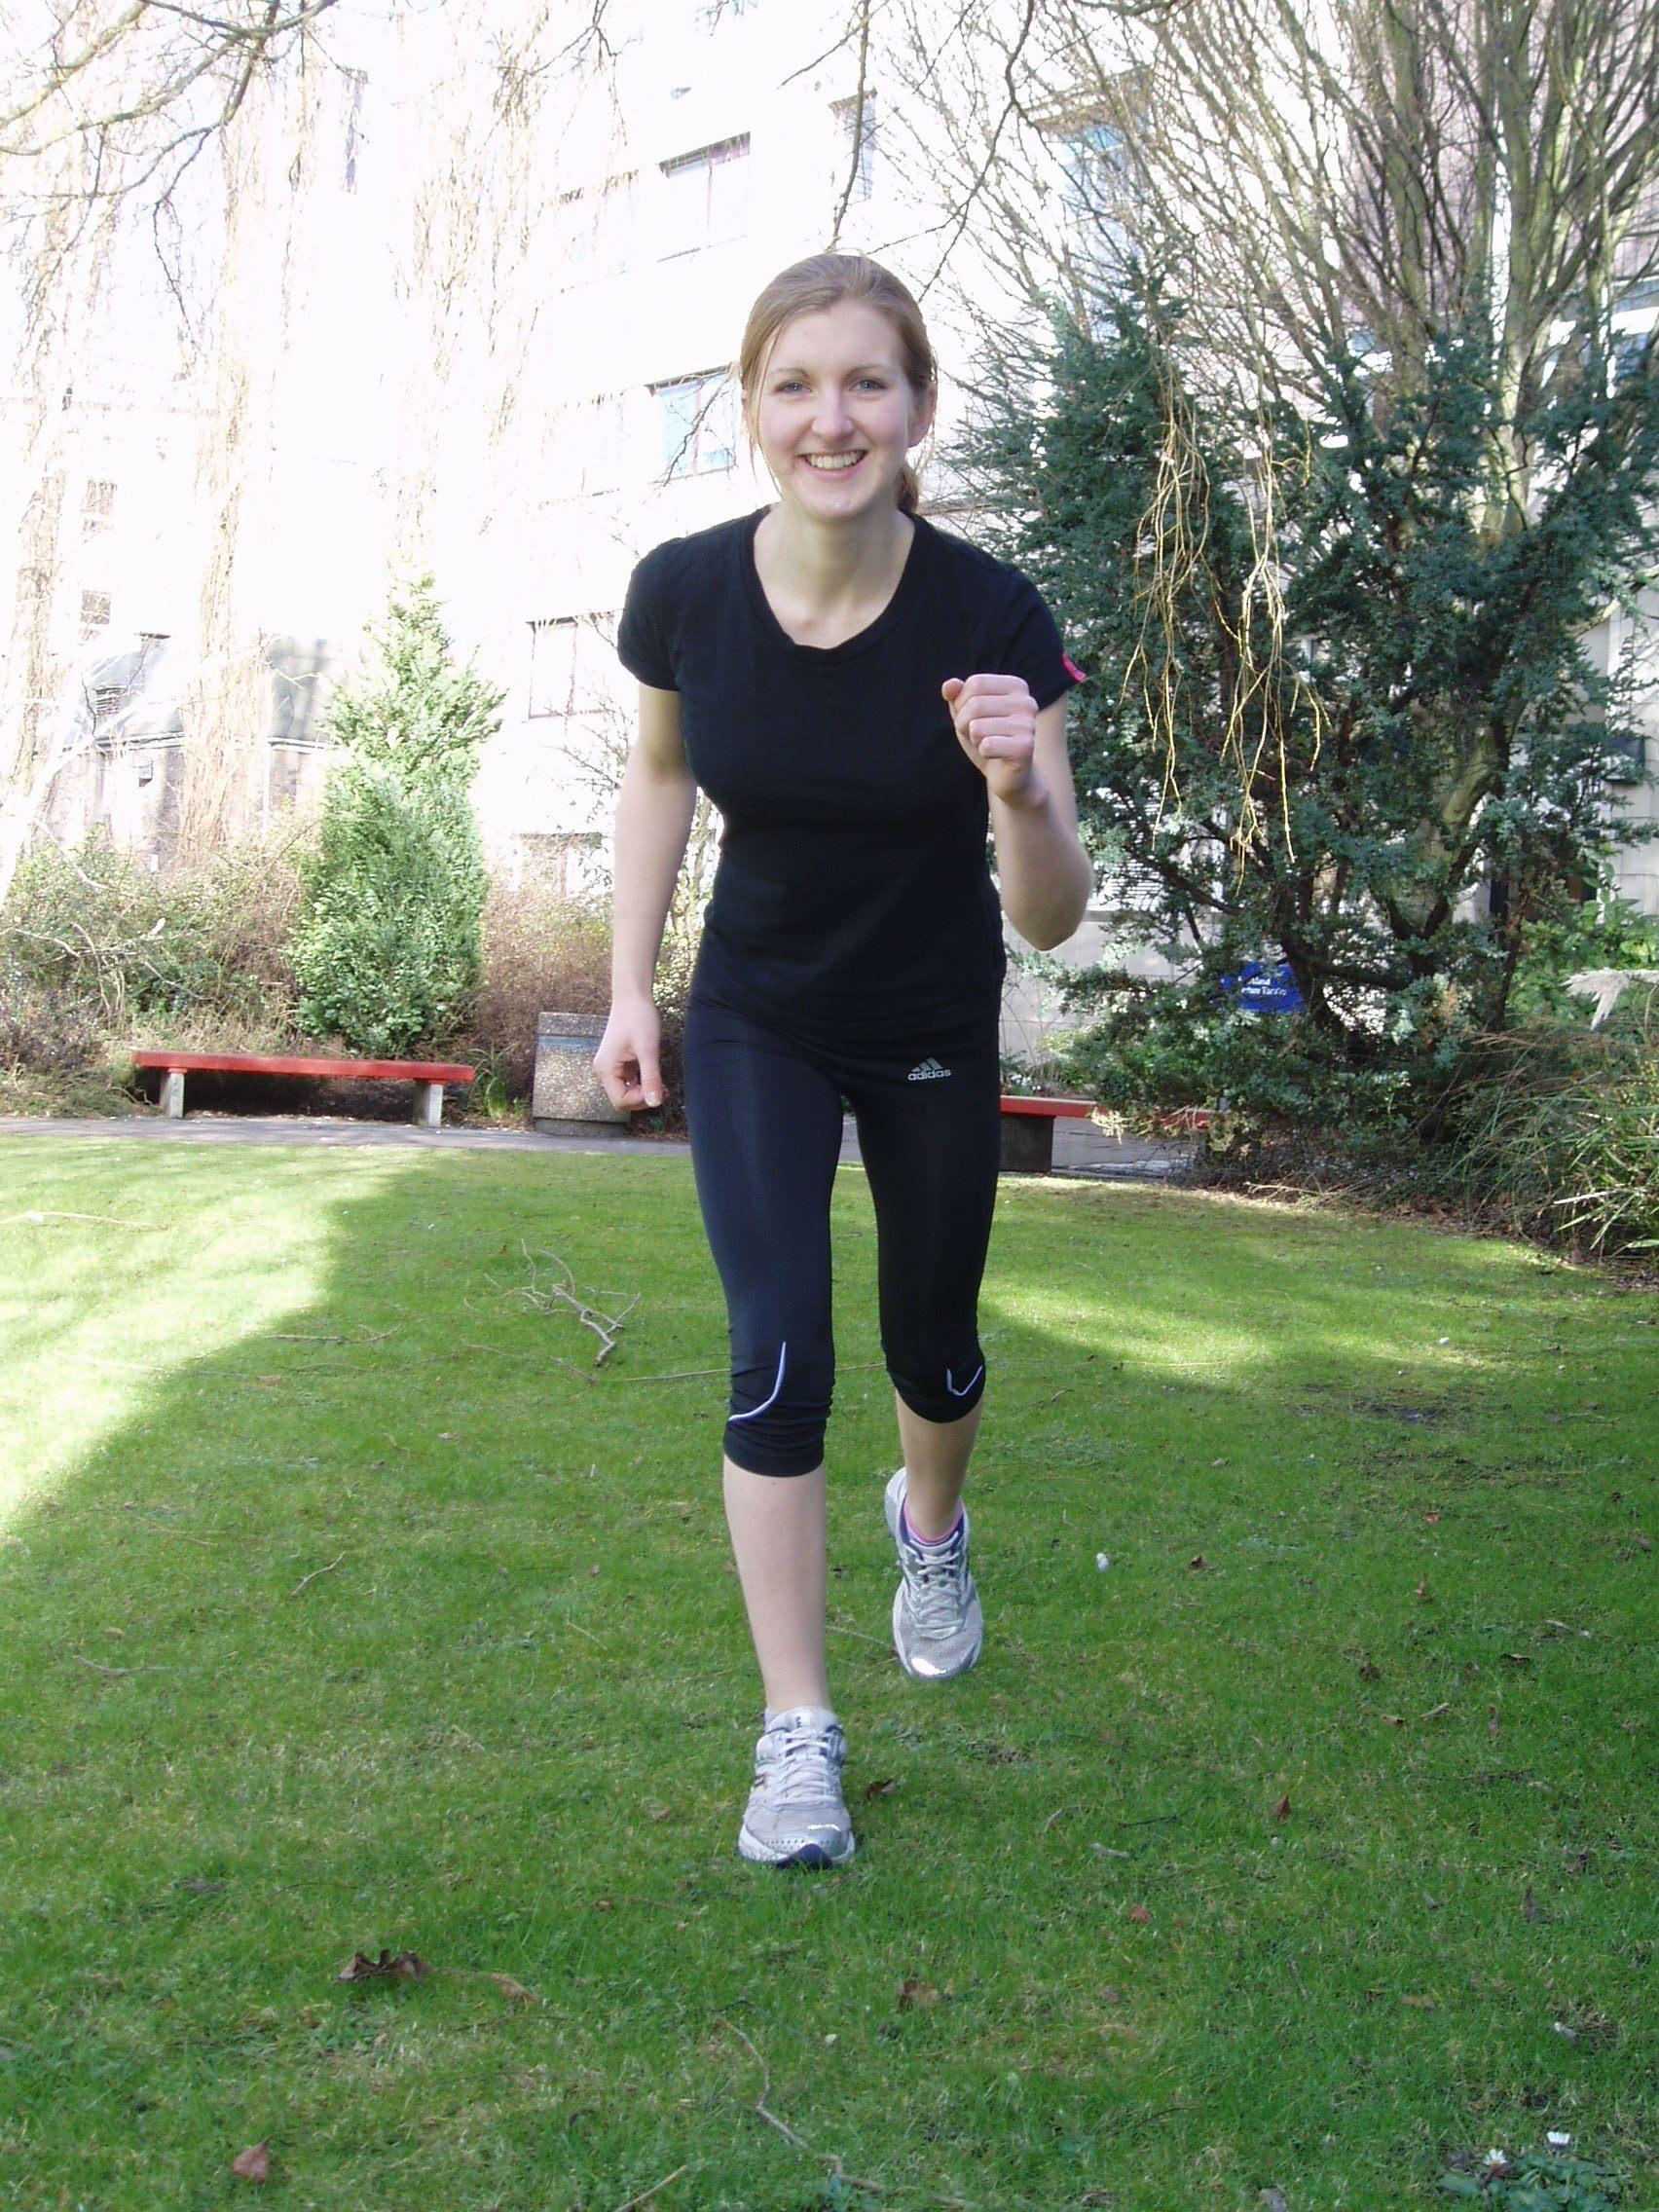 Running makes me smile